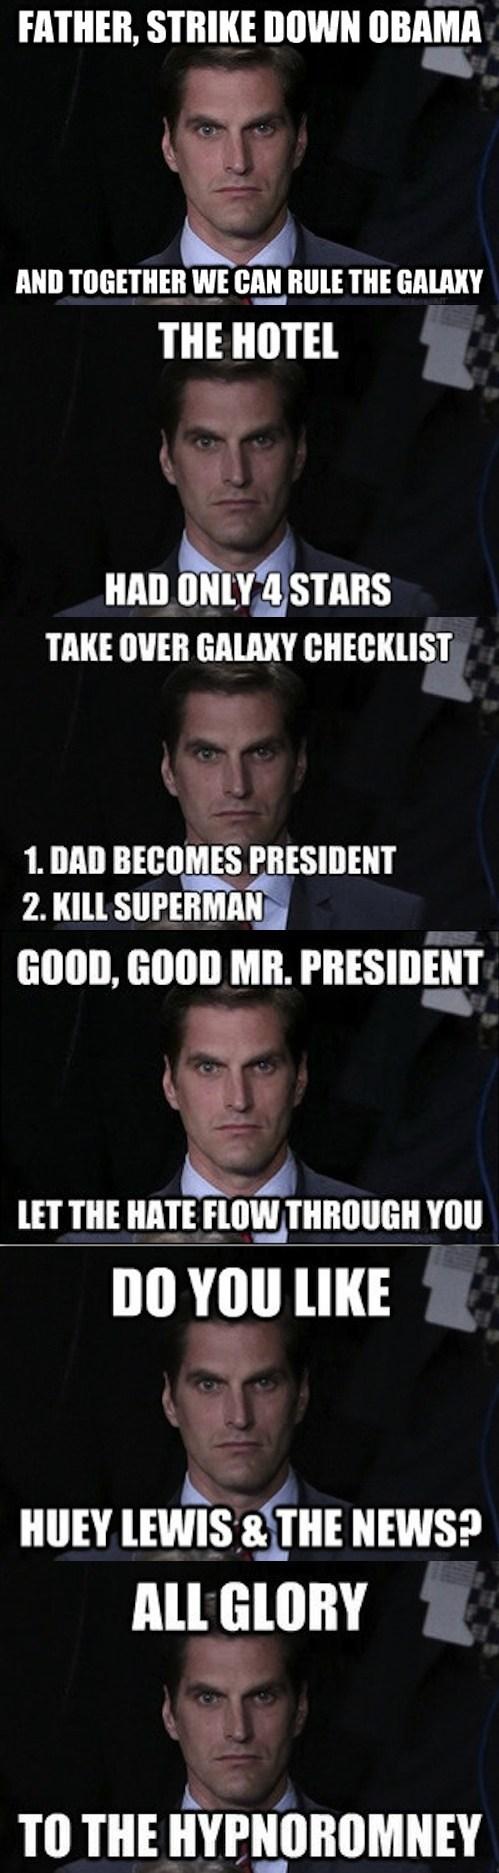 Josh Romney obama debate menacing Josh Romney meme american psycho - 6684750592